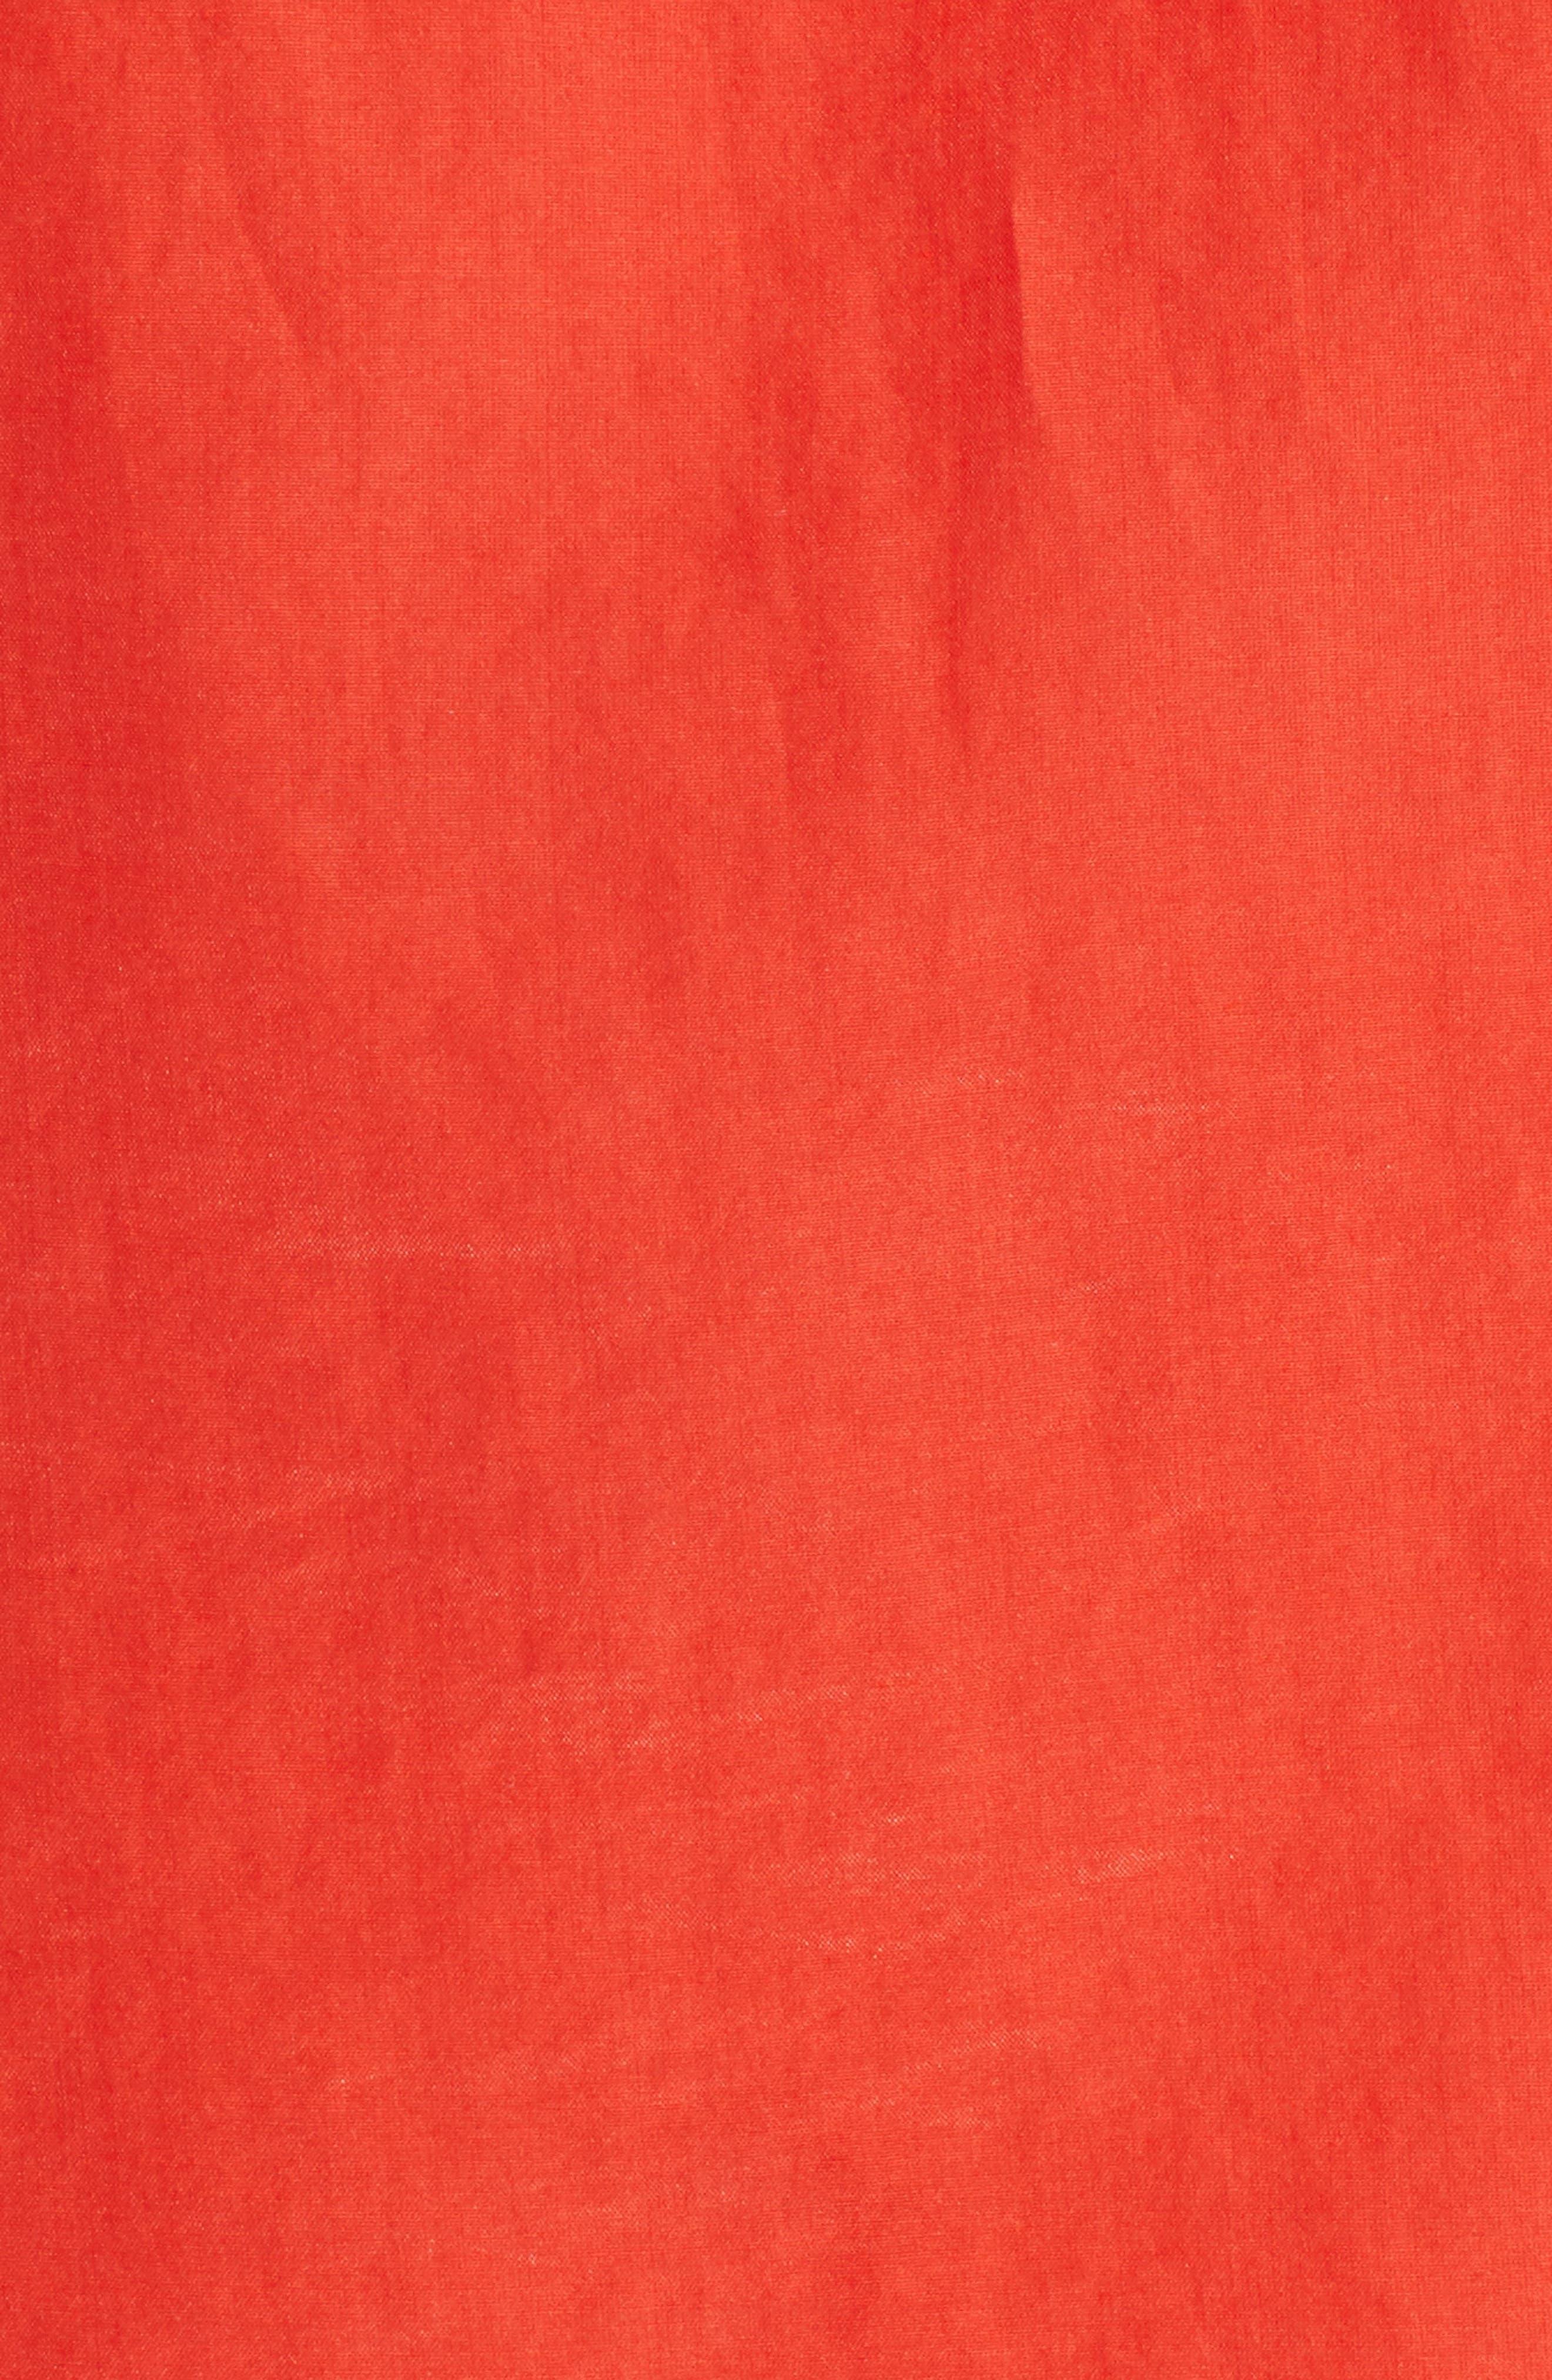 Silk and Cotton Ruffled Top,                             Alternate thumbnail 6, color,                             Cardinal